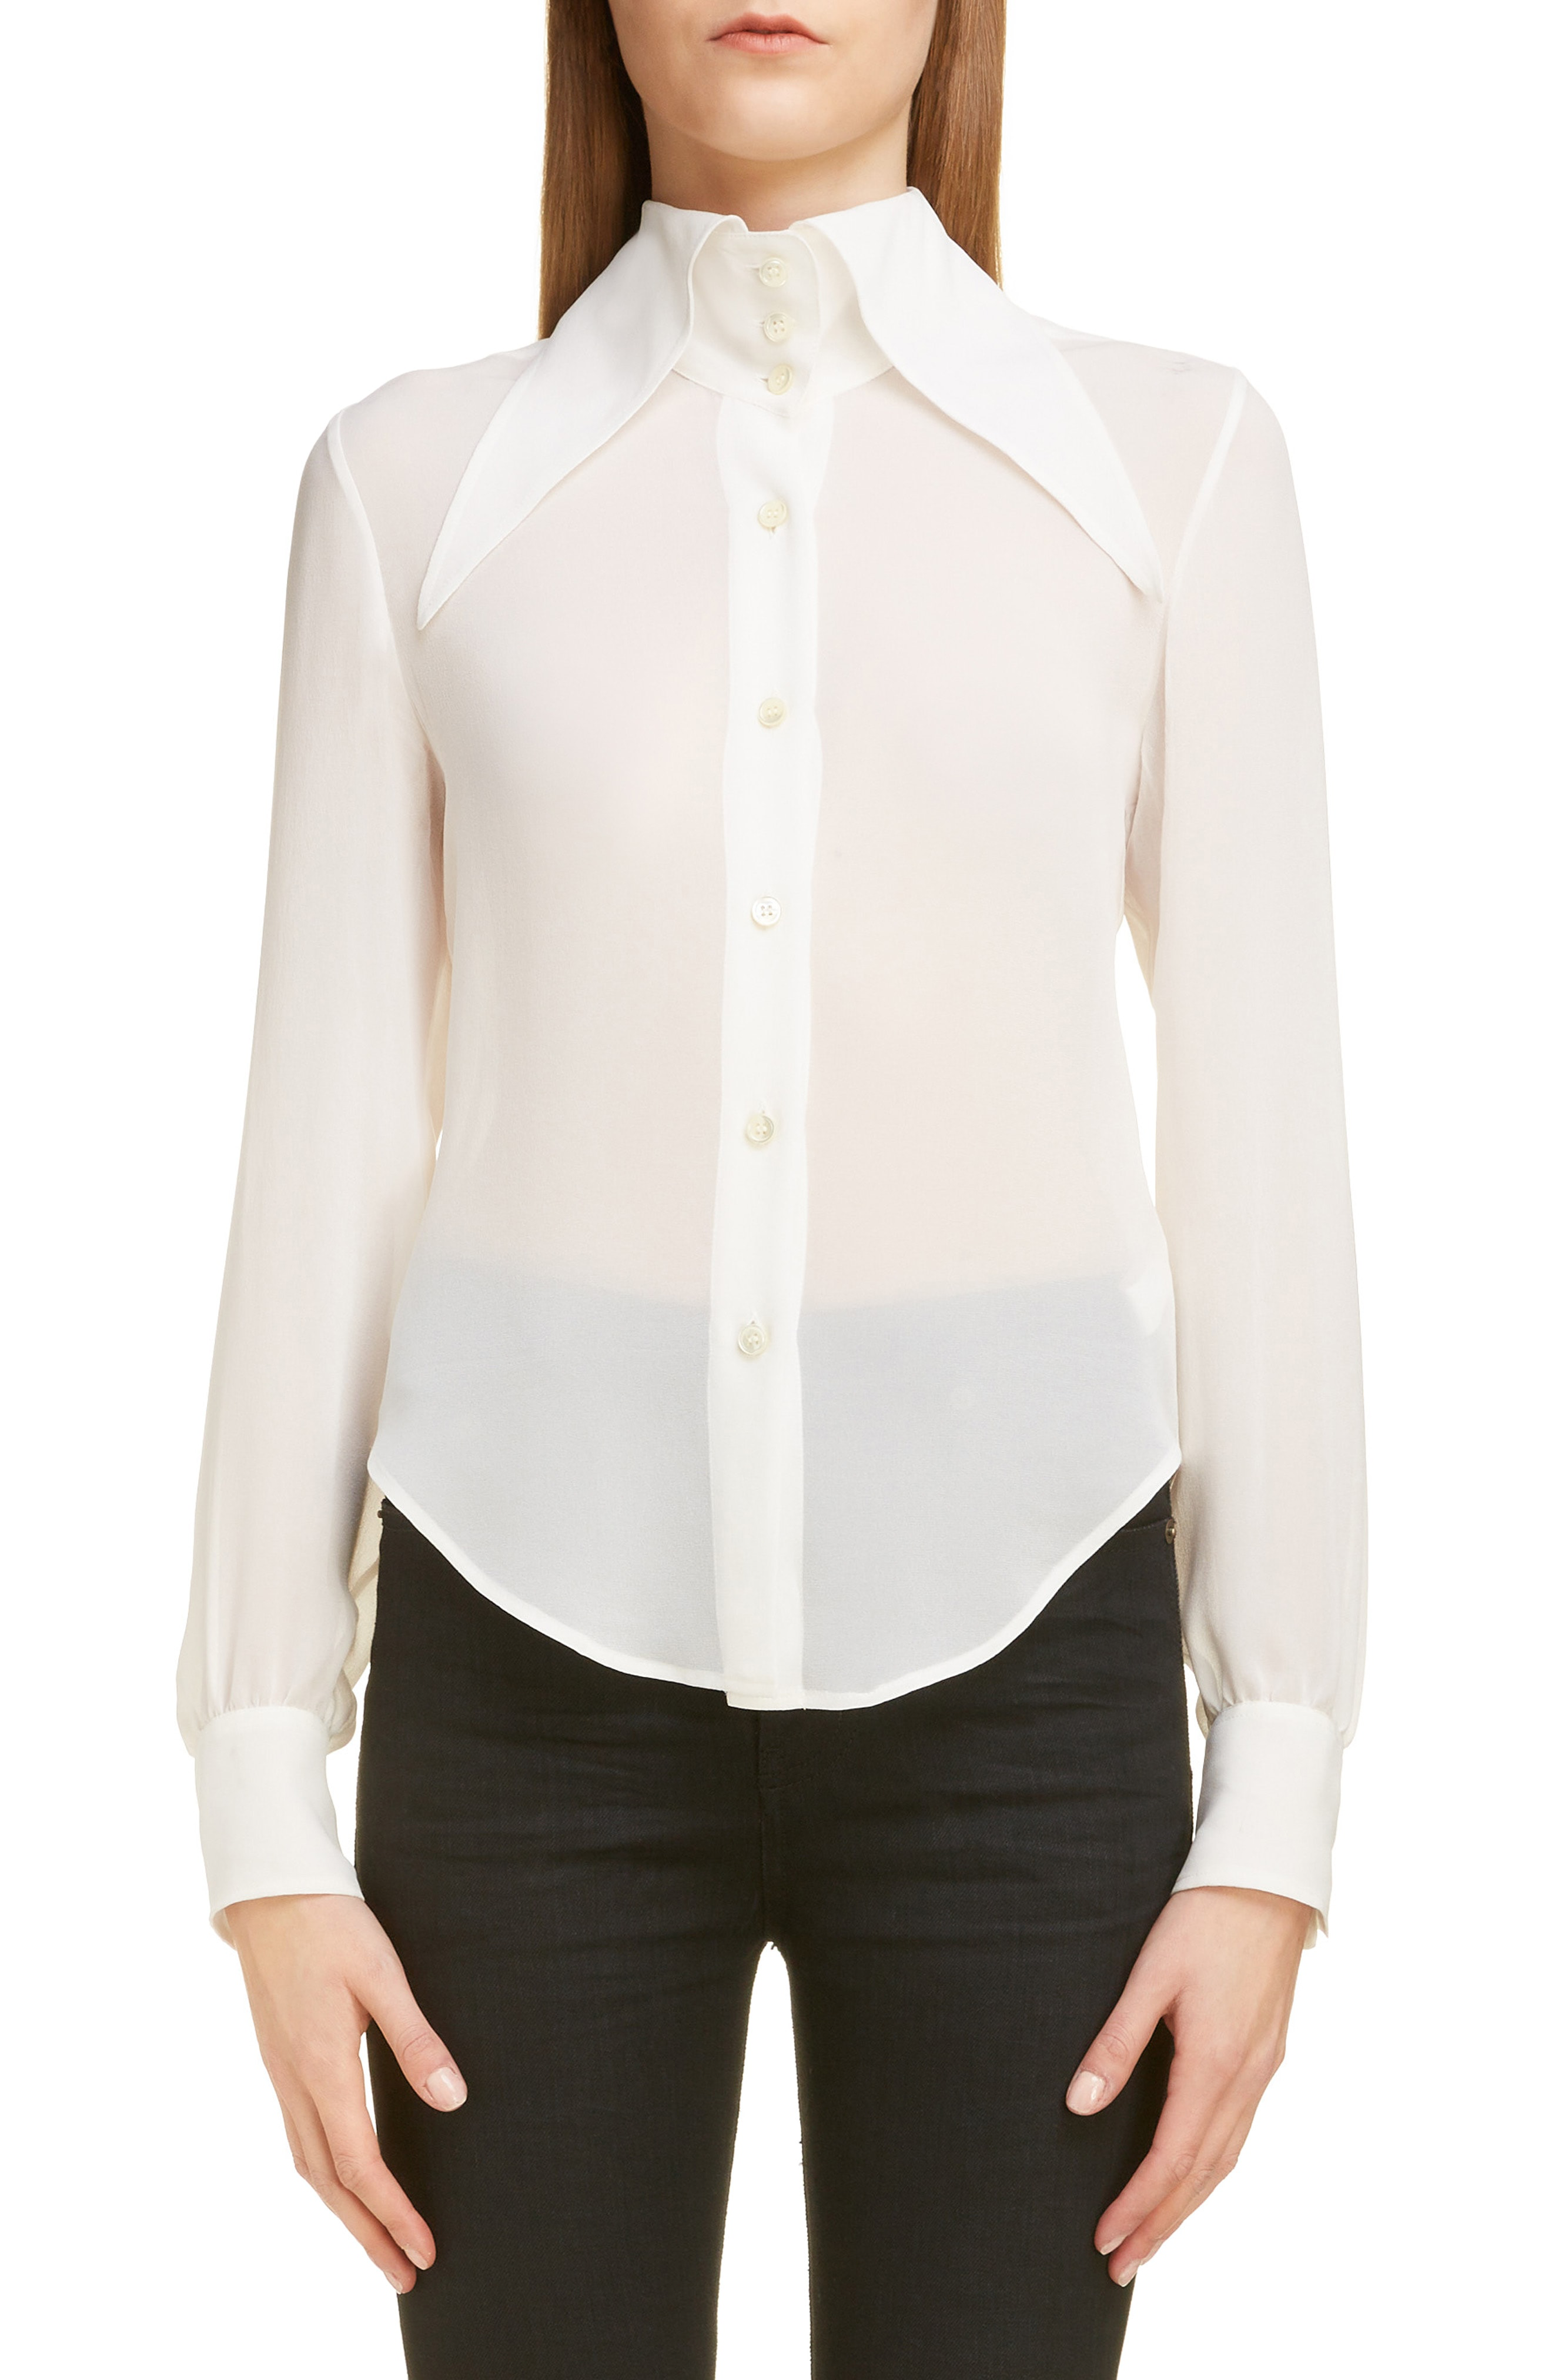 a45f7e333 Saint Laurent Oversized Collar Sheer Silk Button-Down Blouse In Cream